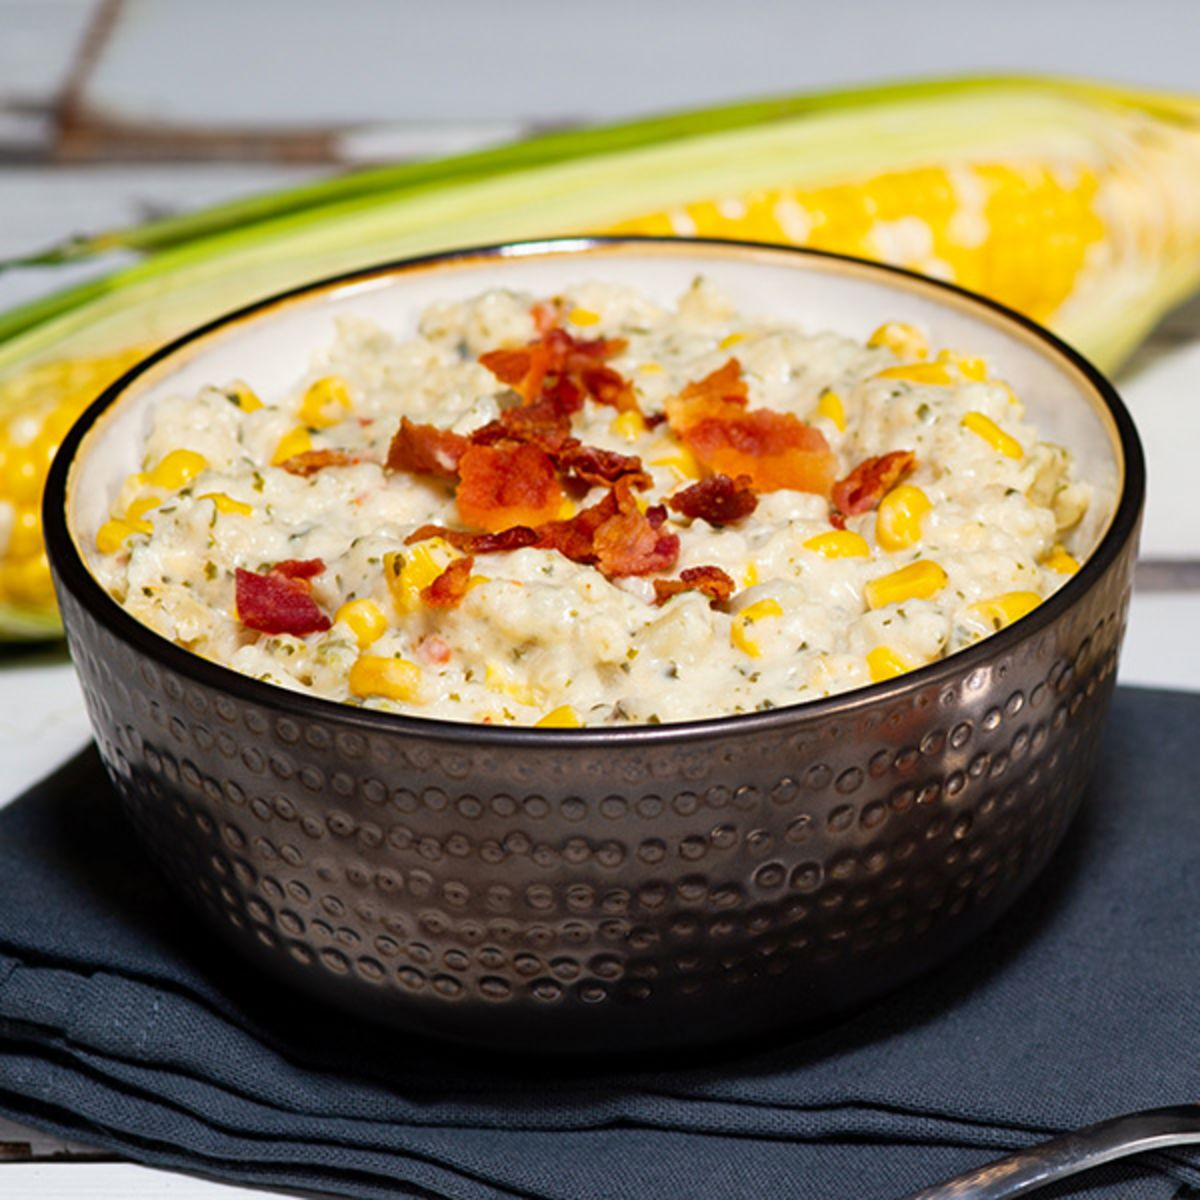 BUNN Gourmet Corn Country Chowder